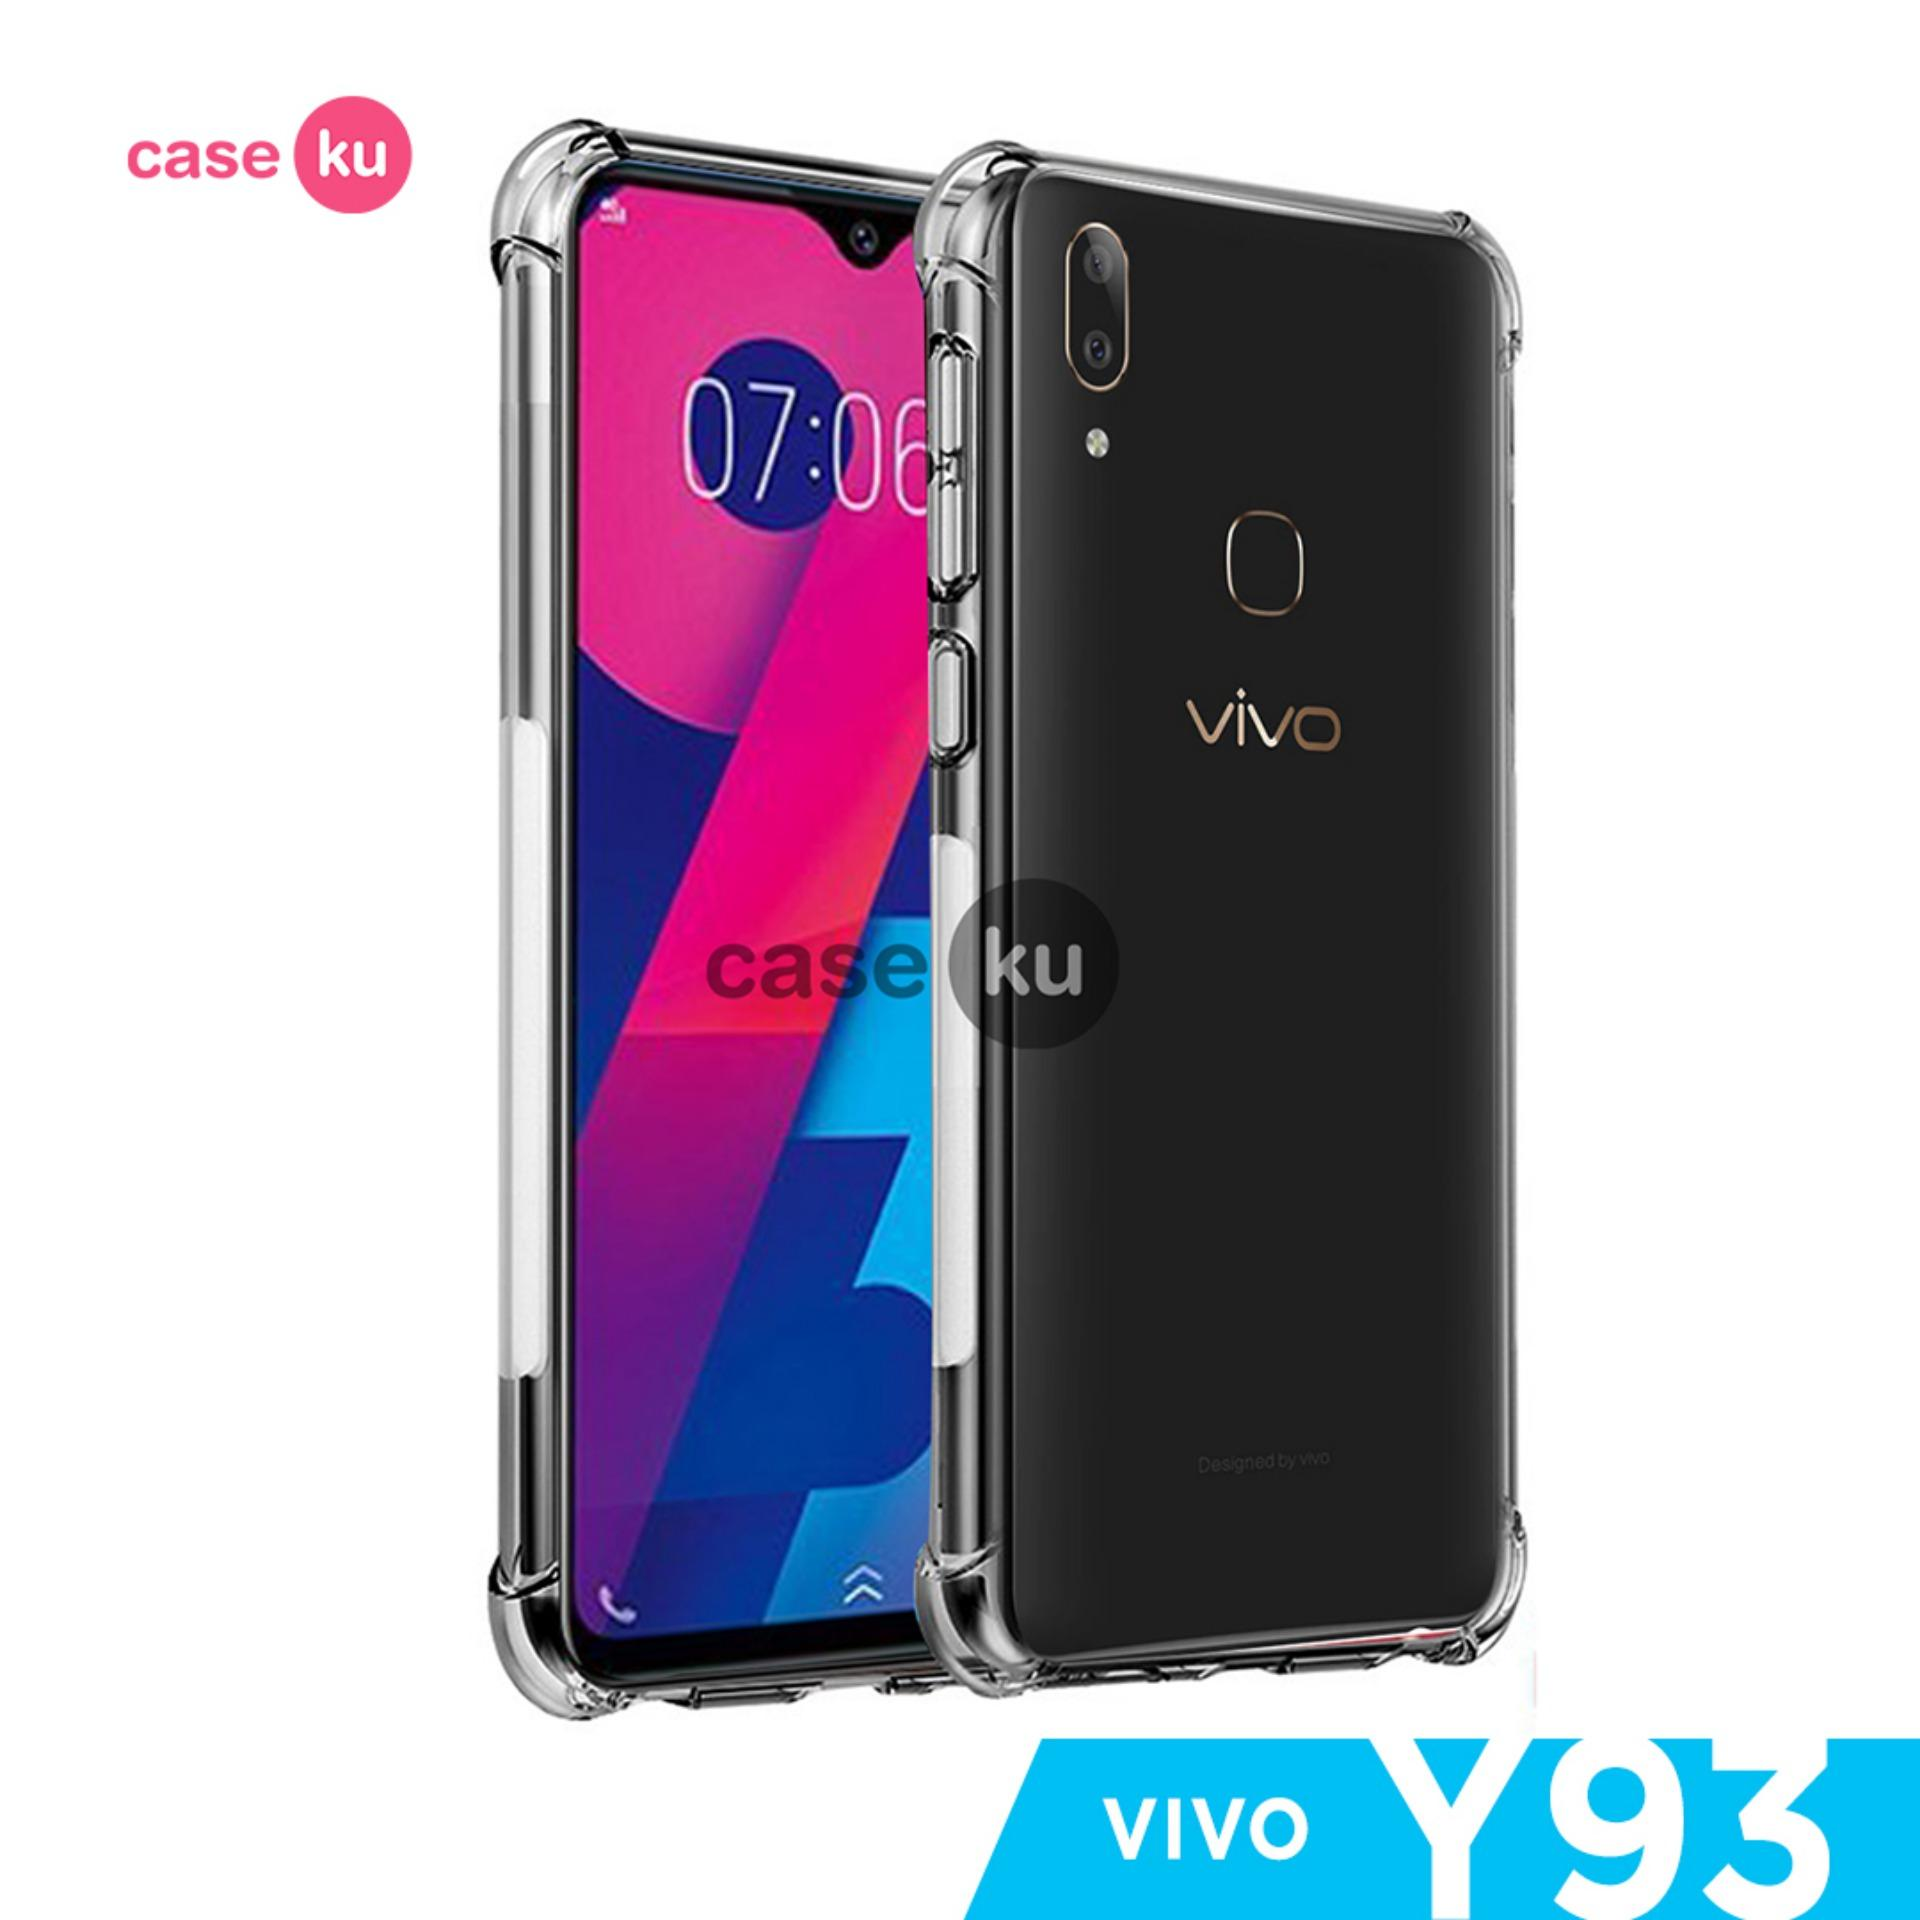 Caseku Vivo Y91,Y93,Y95 Anti Crack Ultra Thin Anti Shock Jelly Silikon Shockproof Softcase - Bening